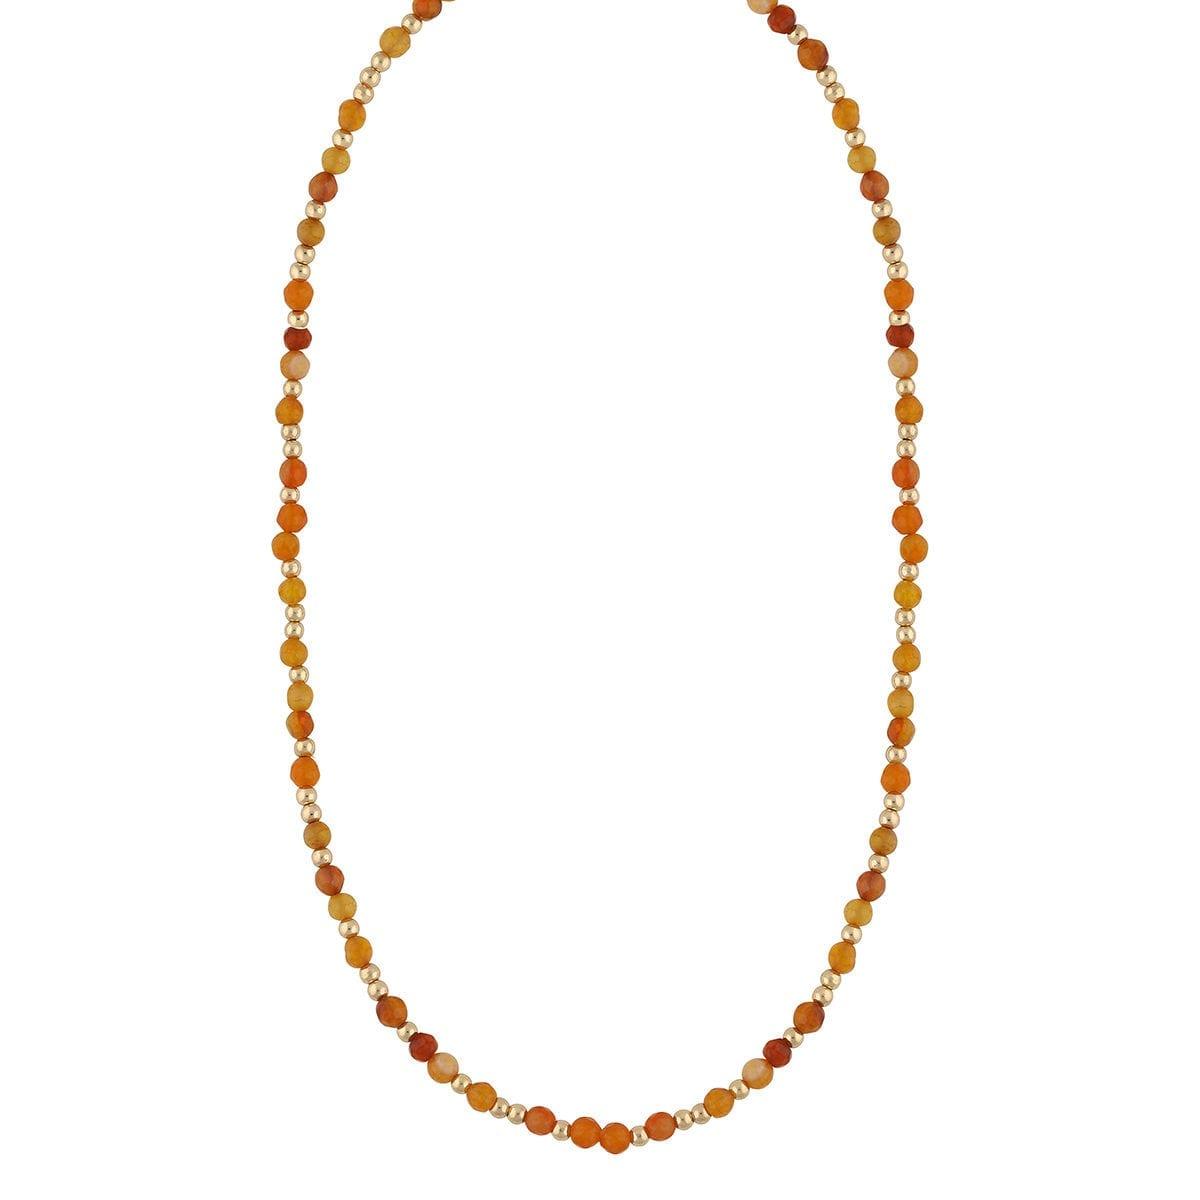 1004-0101224-Roc-neck-42-g-amber